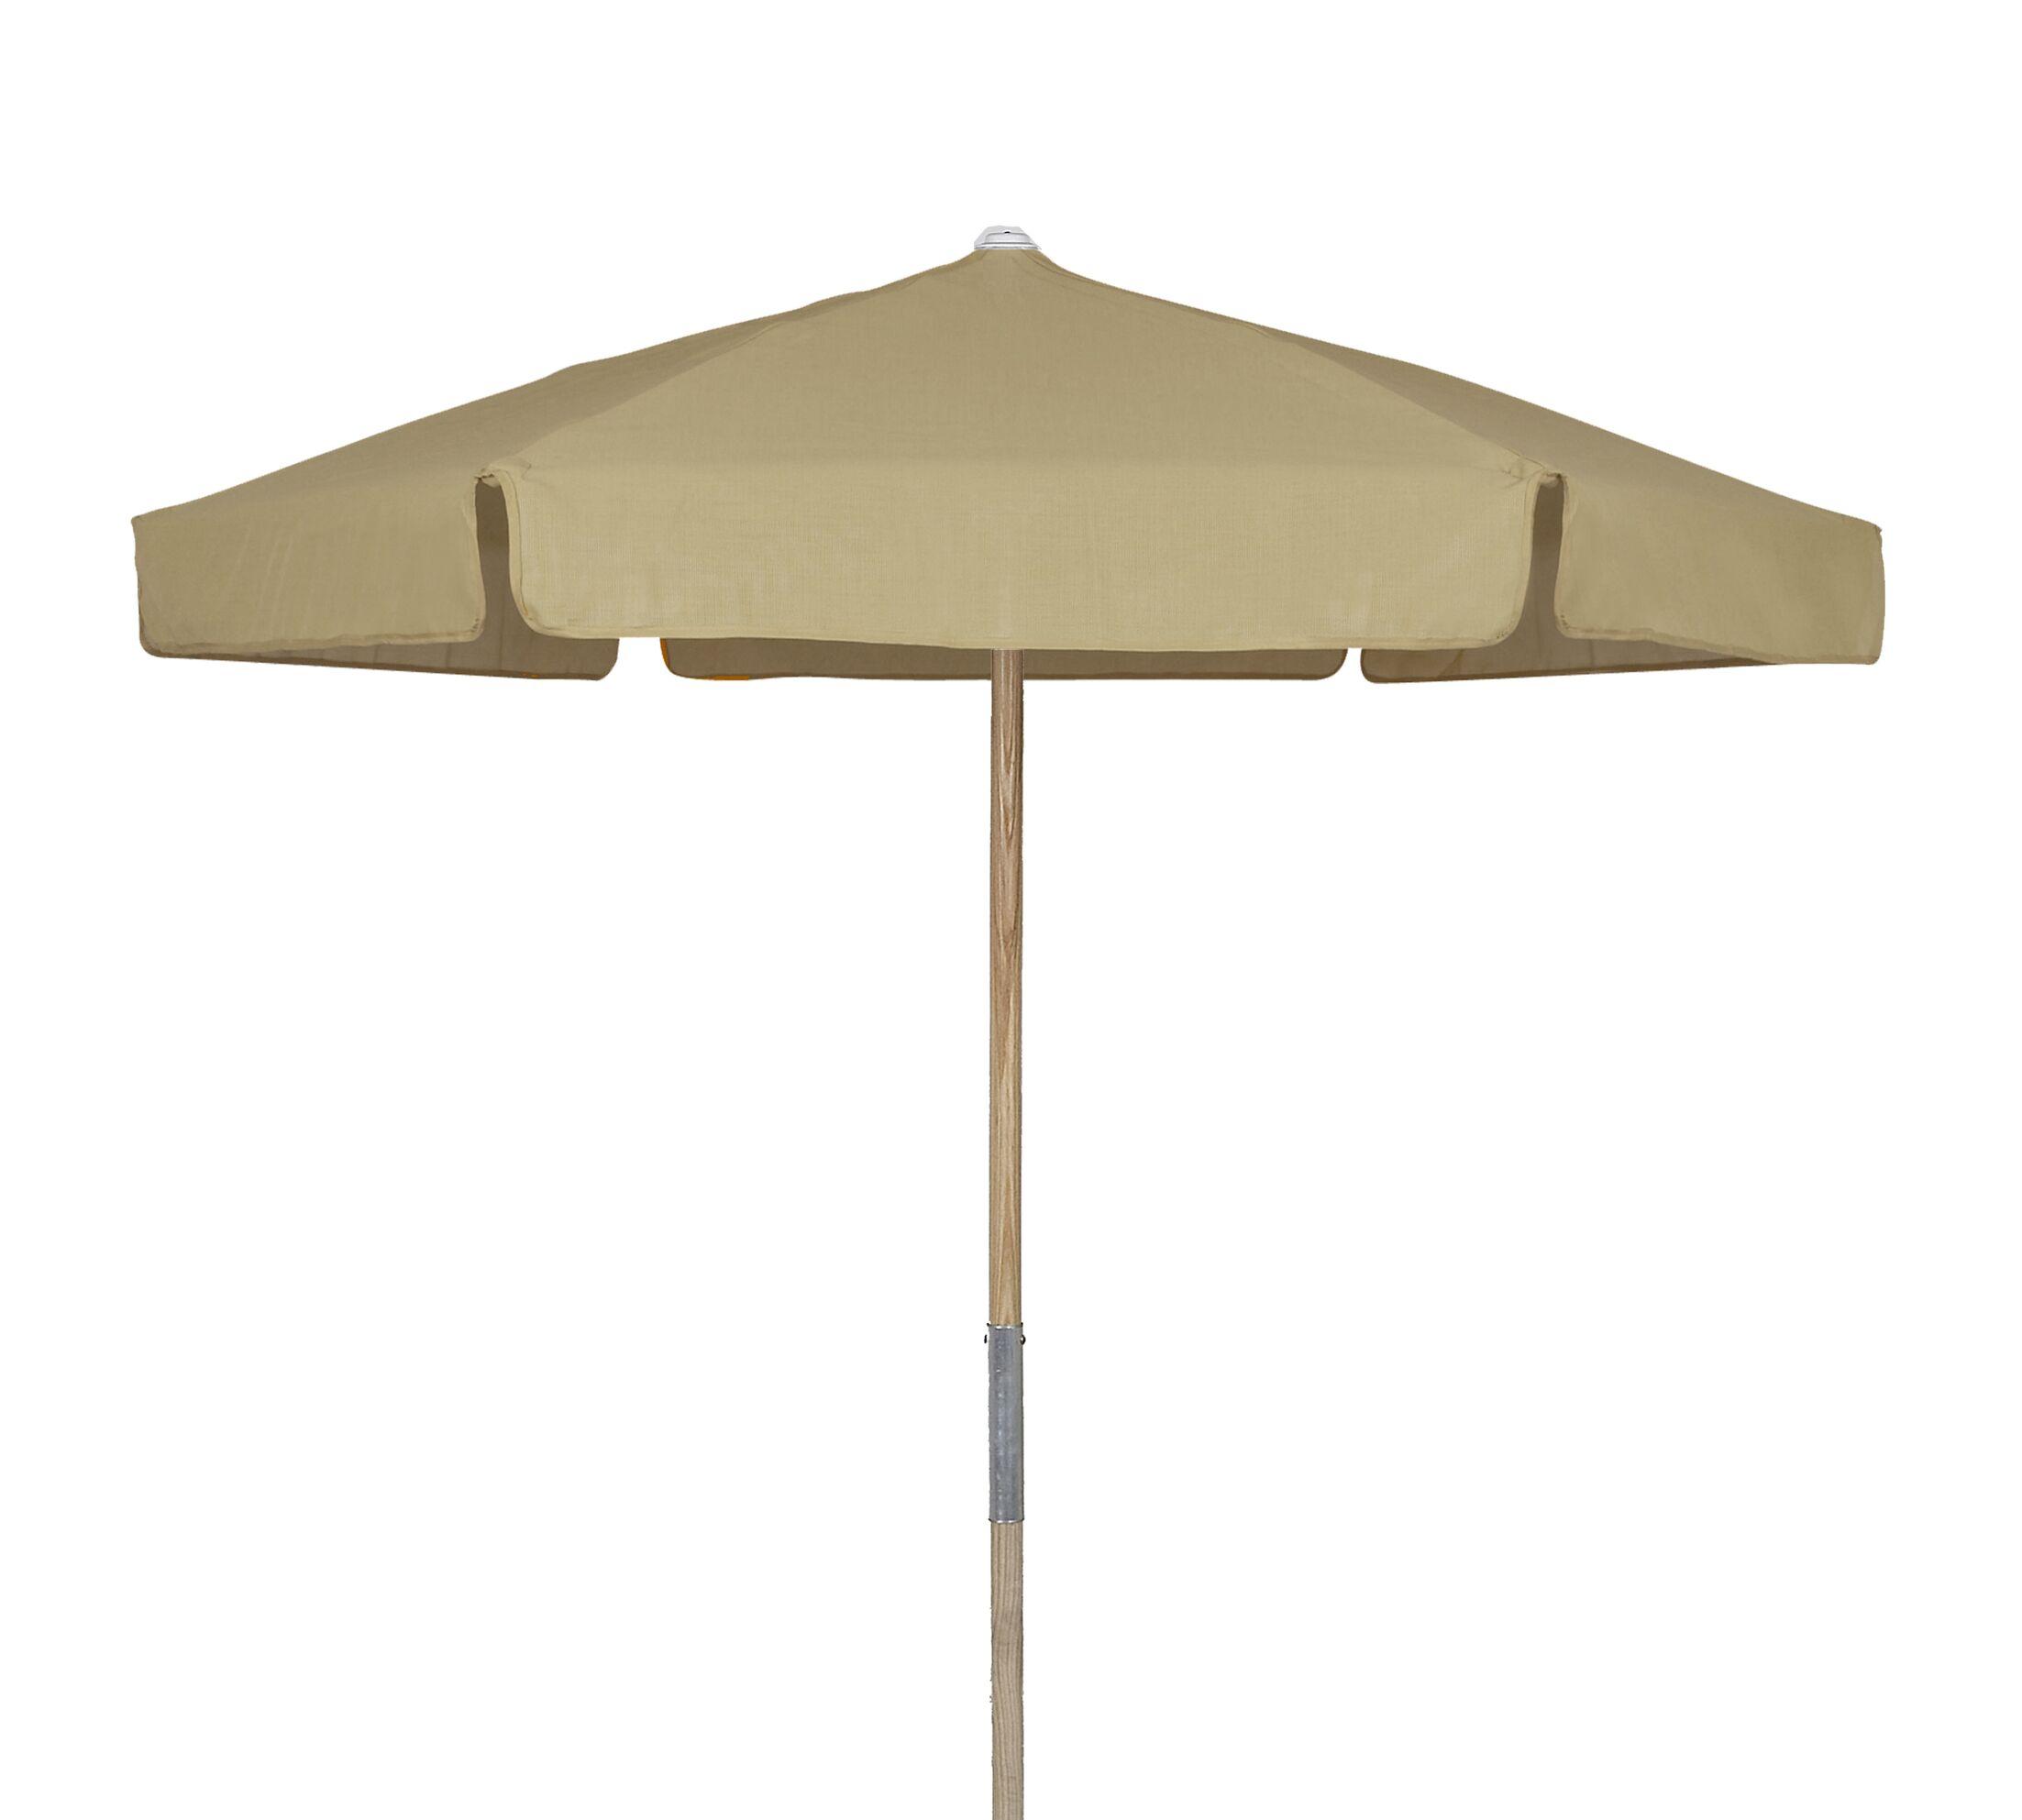 Market 7.5' Beach Umbrella Fabric: Beige